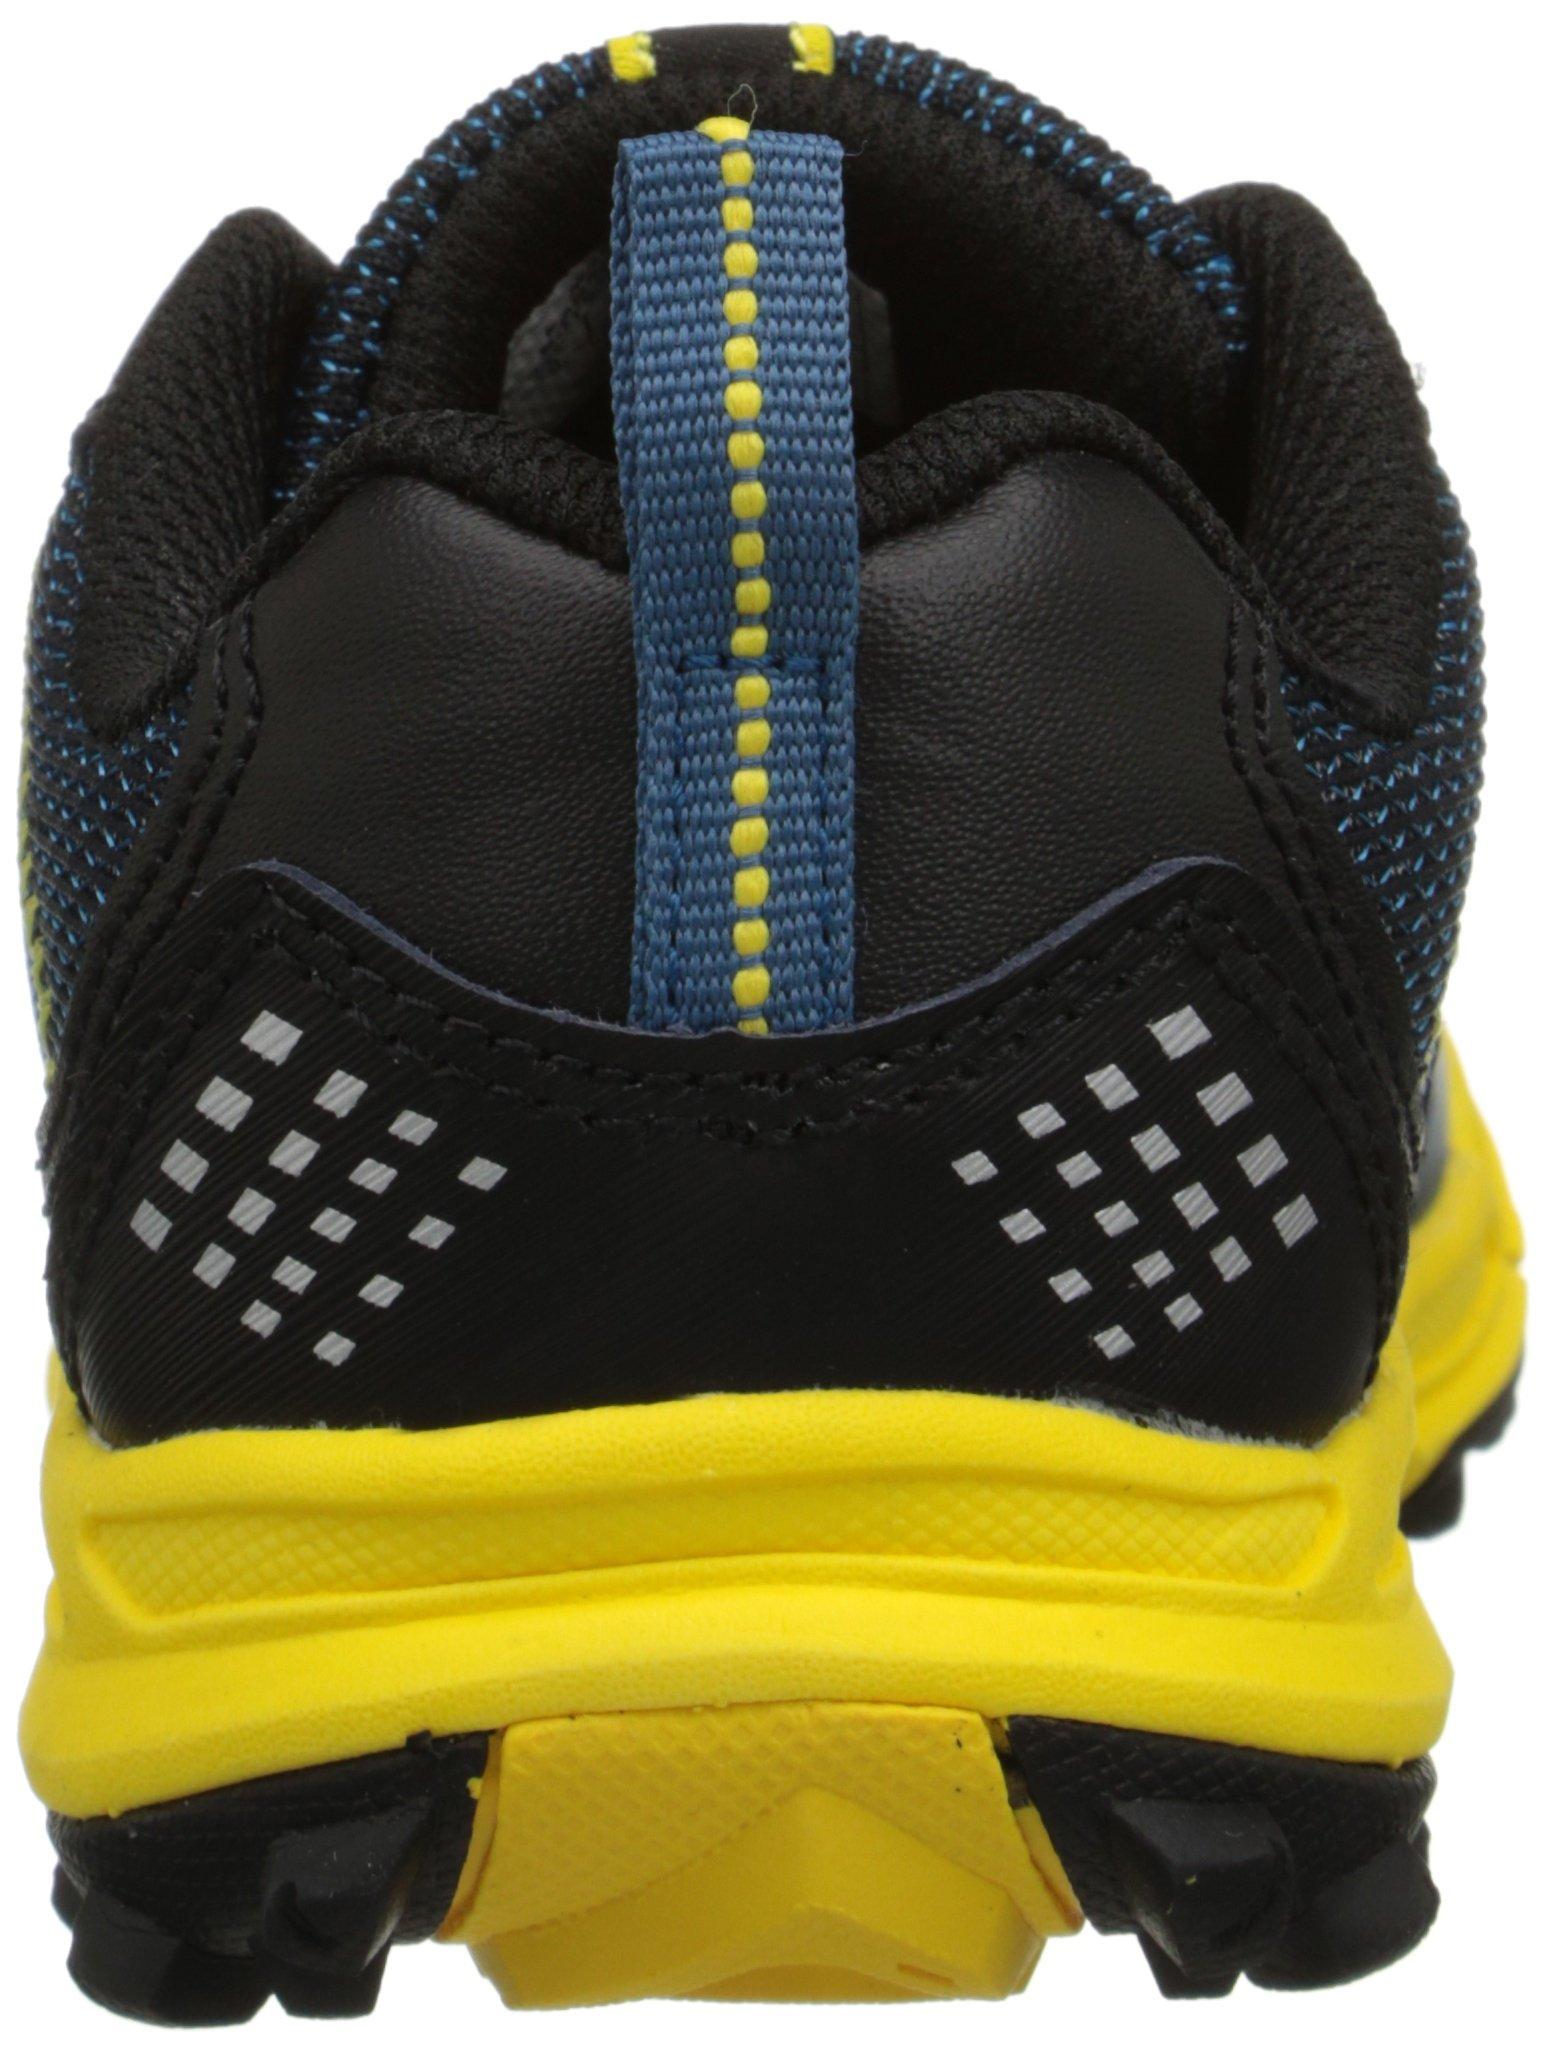 Teva Escapade Lo Athletic Trail Shoe (Little Kid/Big Kid), Blue/Yellow, 11 M US Little Kid by Teva (Image #2)